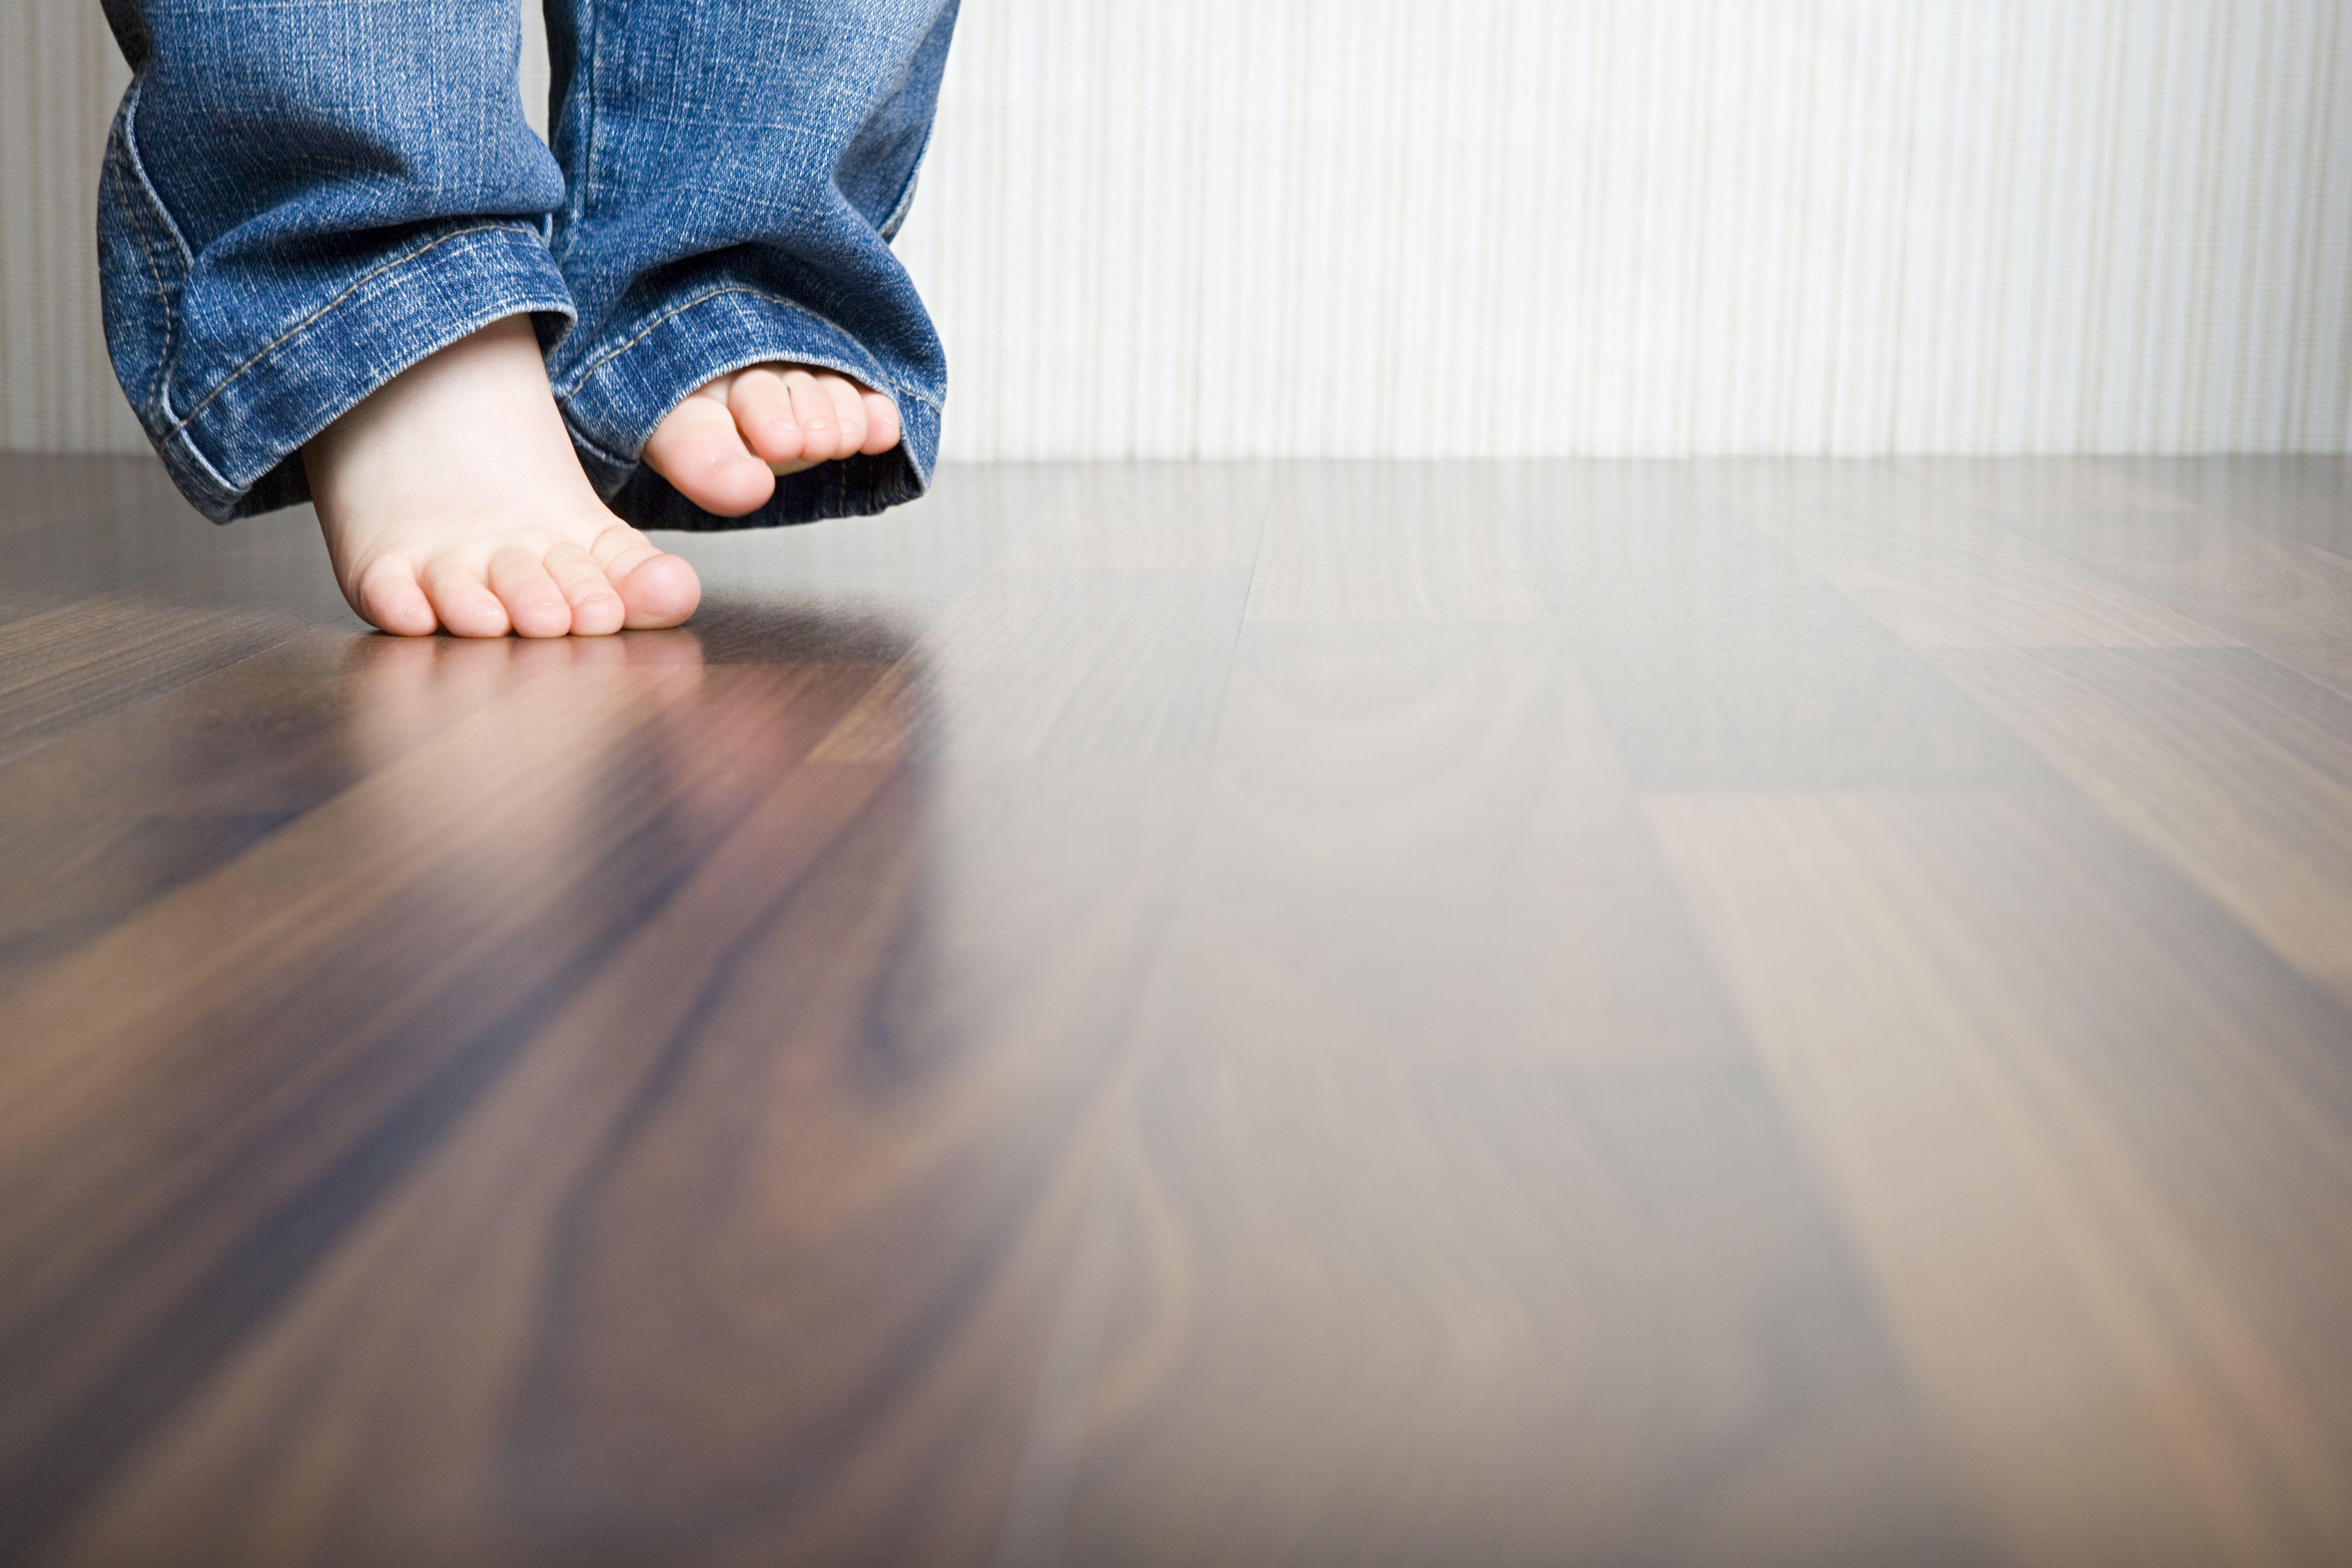 prefinished hardwood floor cleaning tips of how to clean hardwood floors best way to clean wood flooring regarding 1512149908 gettyimages 75403973